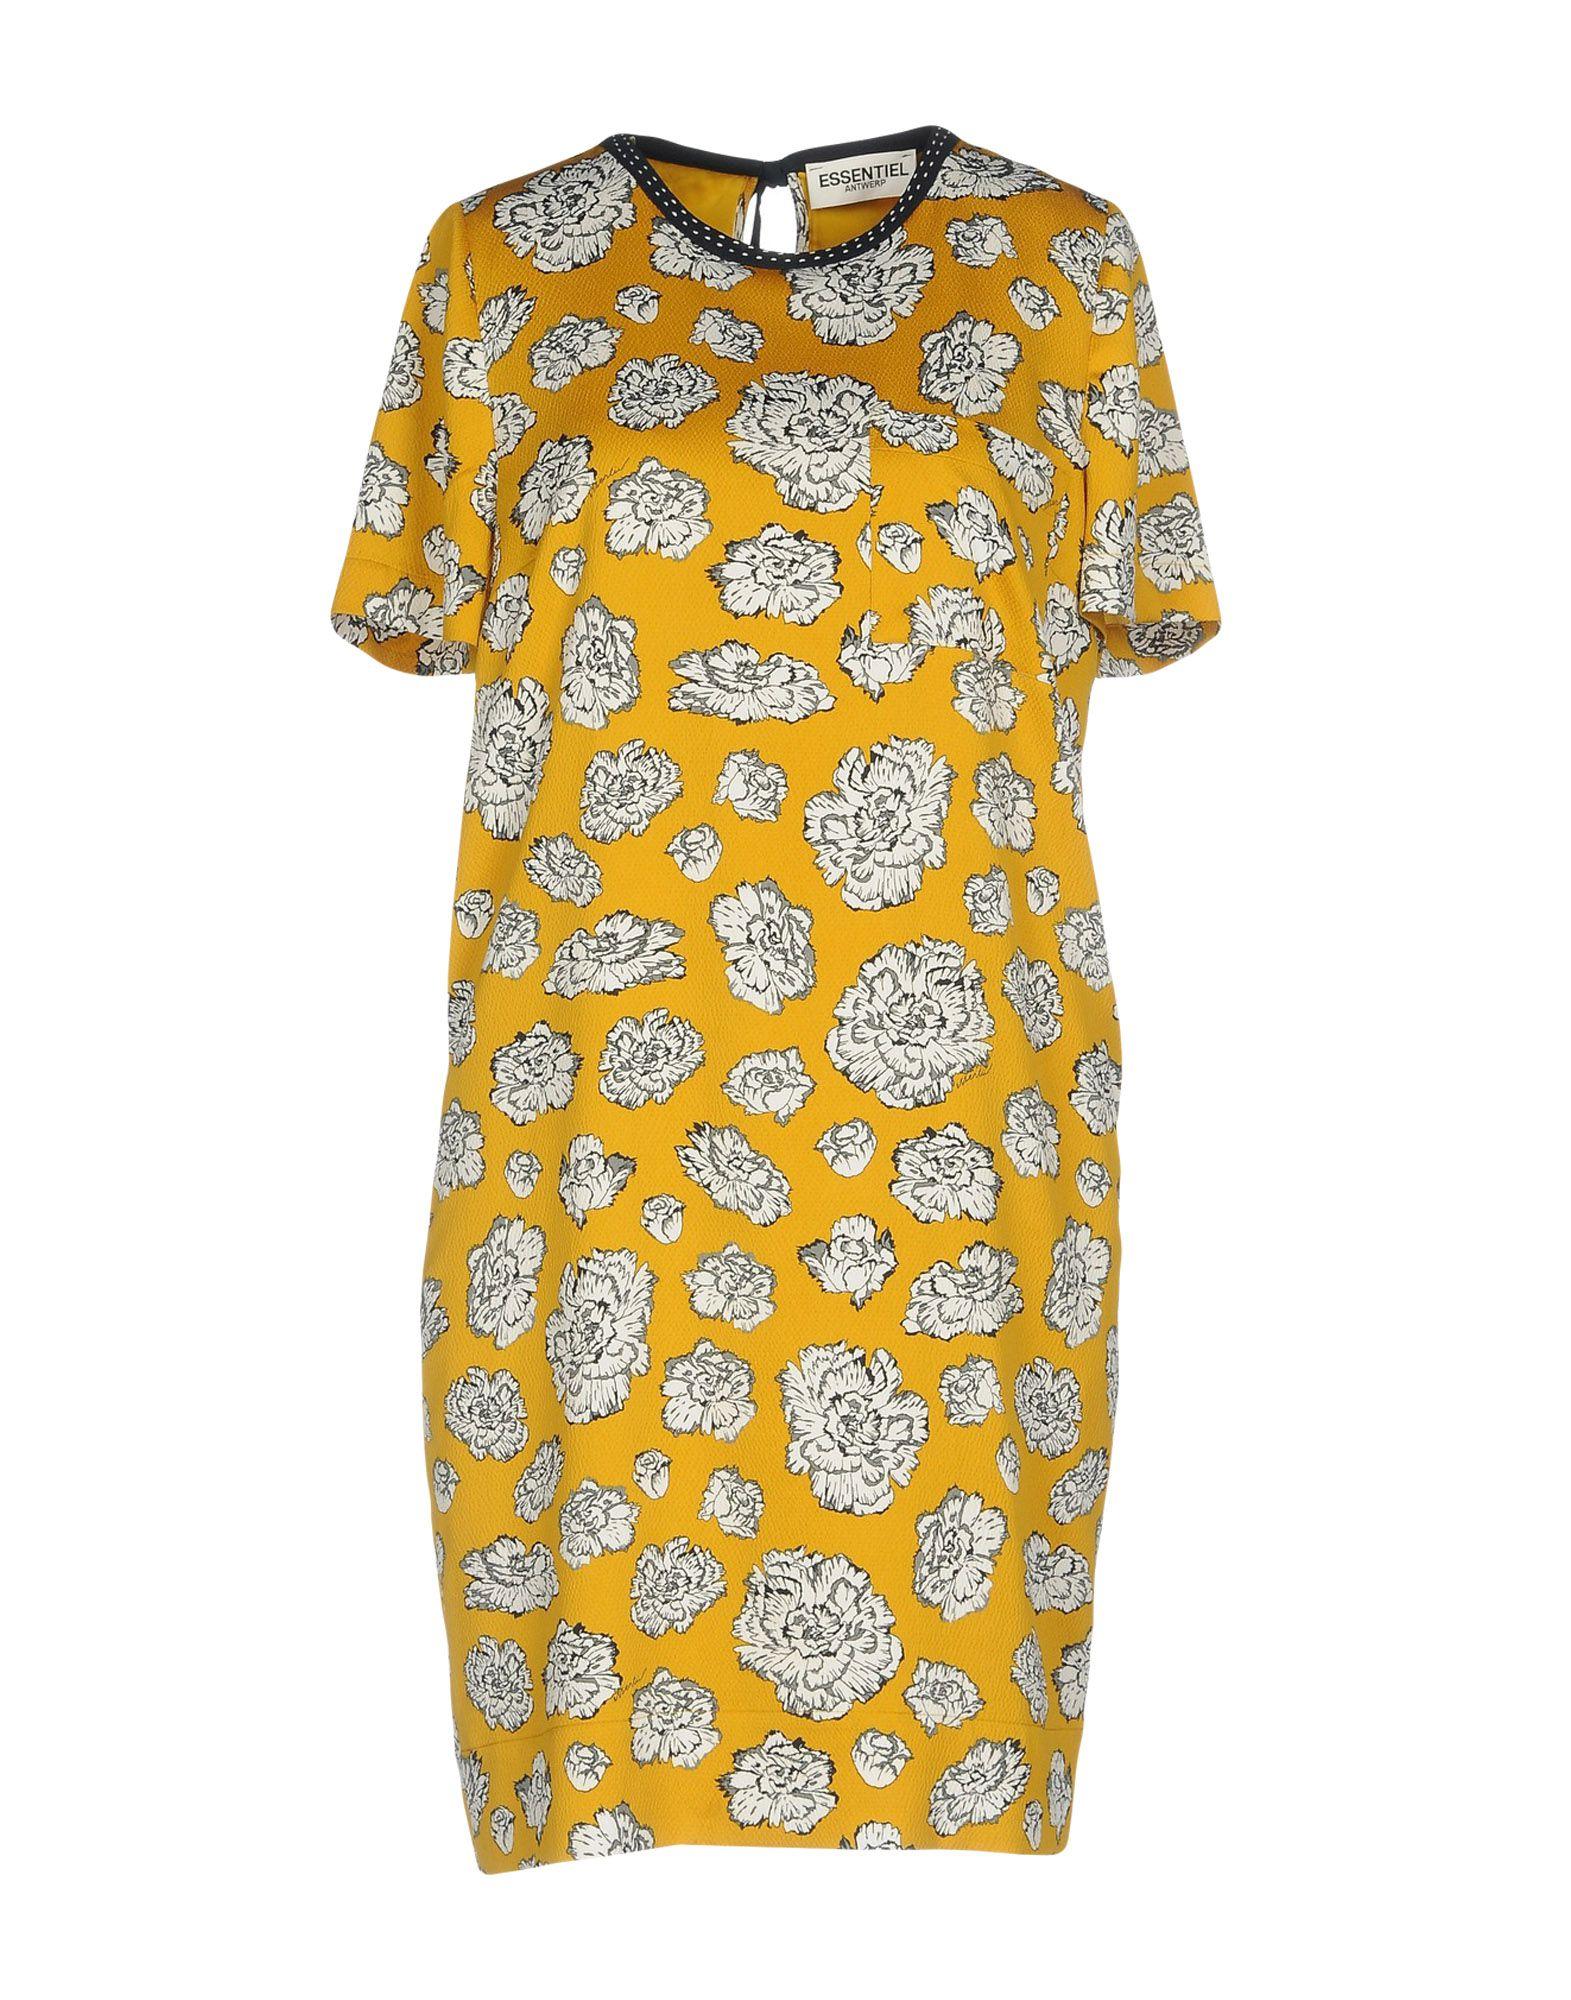 ESSENTIEL ANTWERP Короткое платье essentiel antwerp голубое платье рубашка с поясом